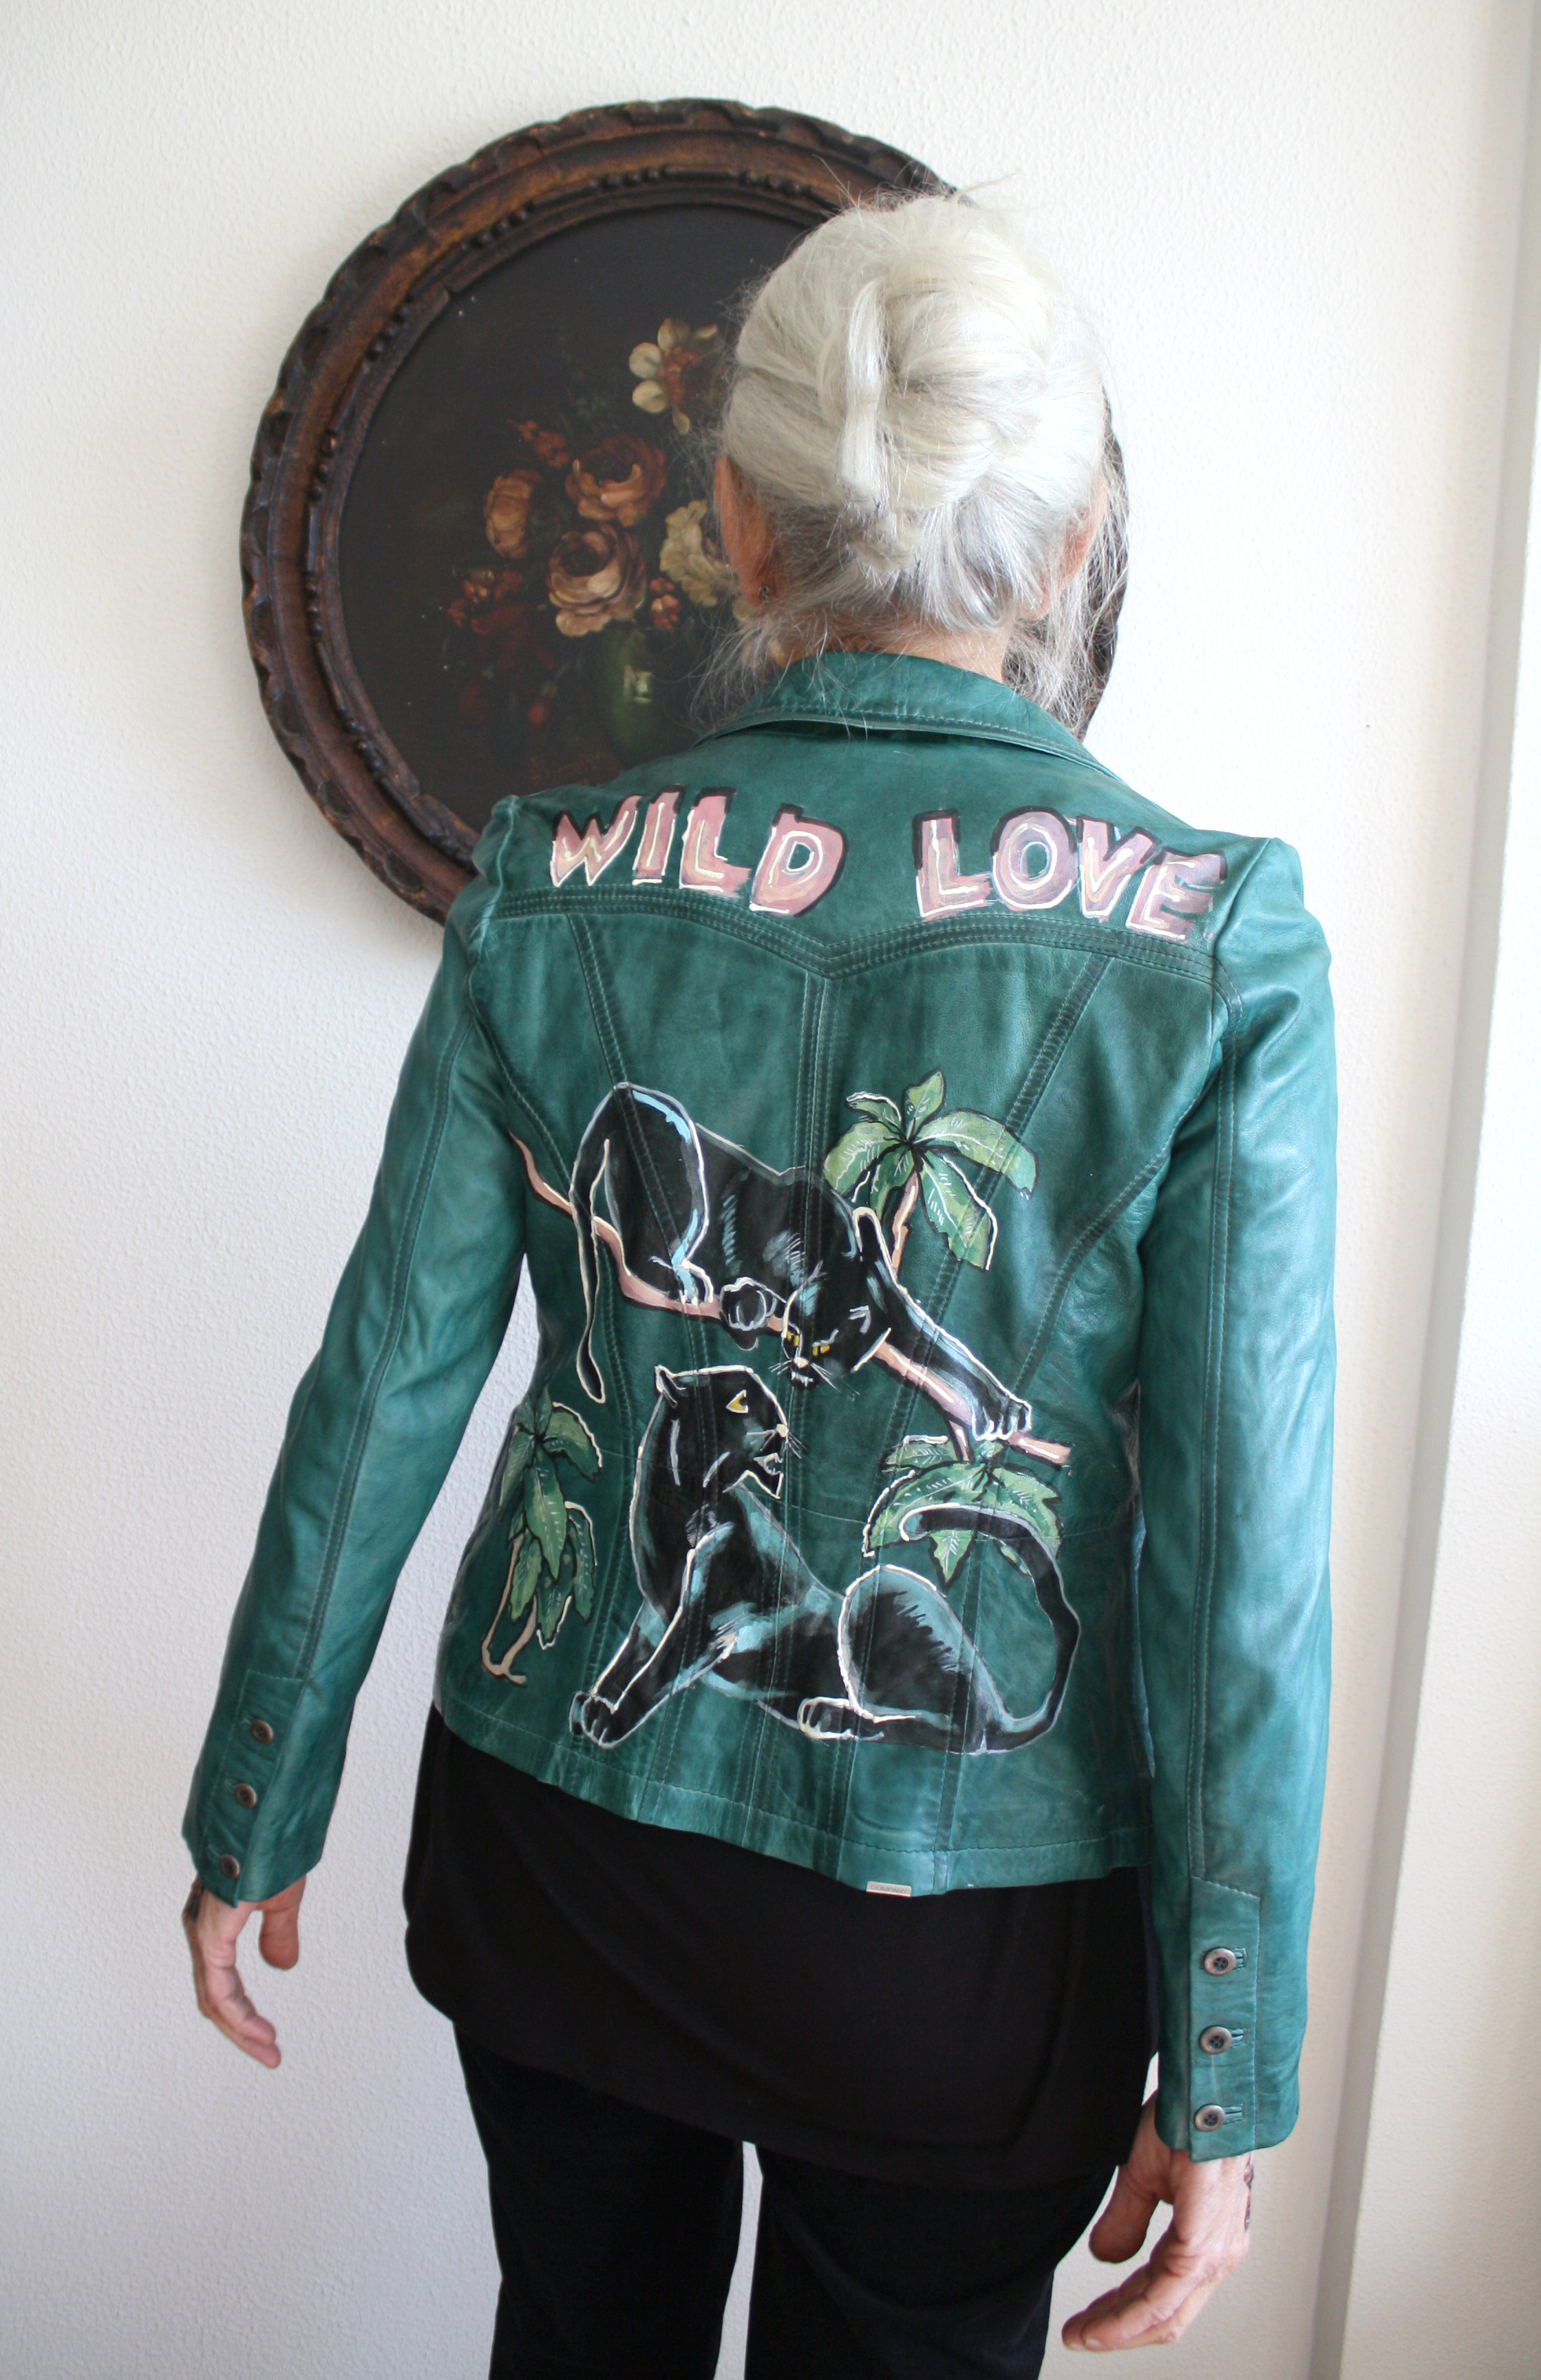 Wild love panther